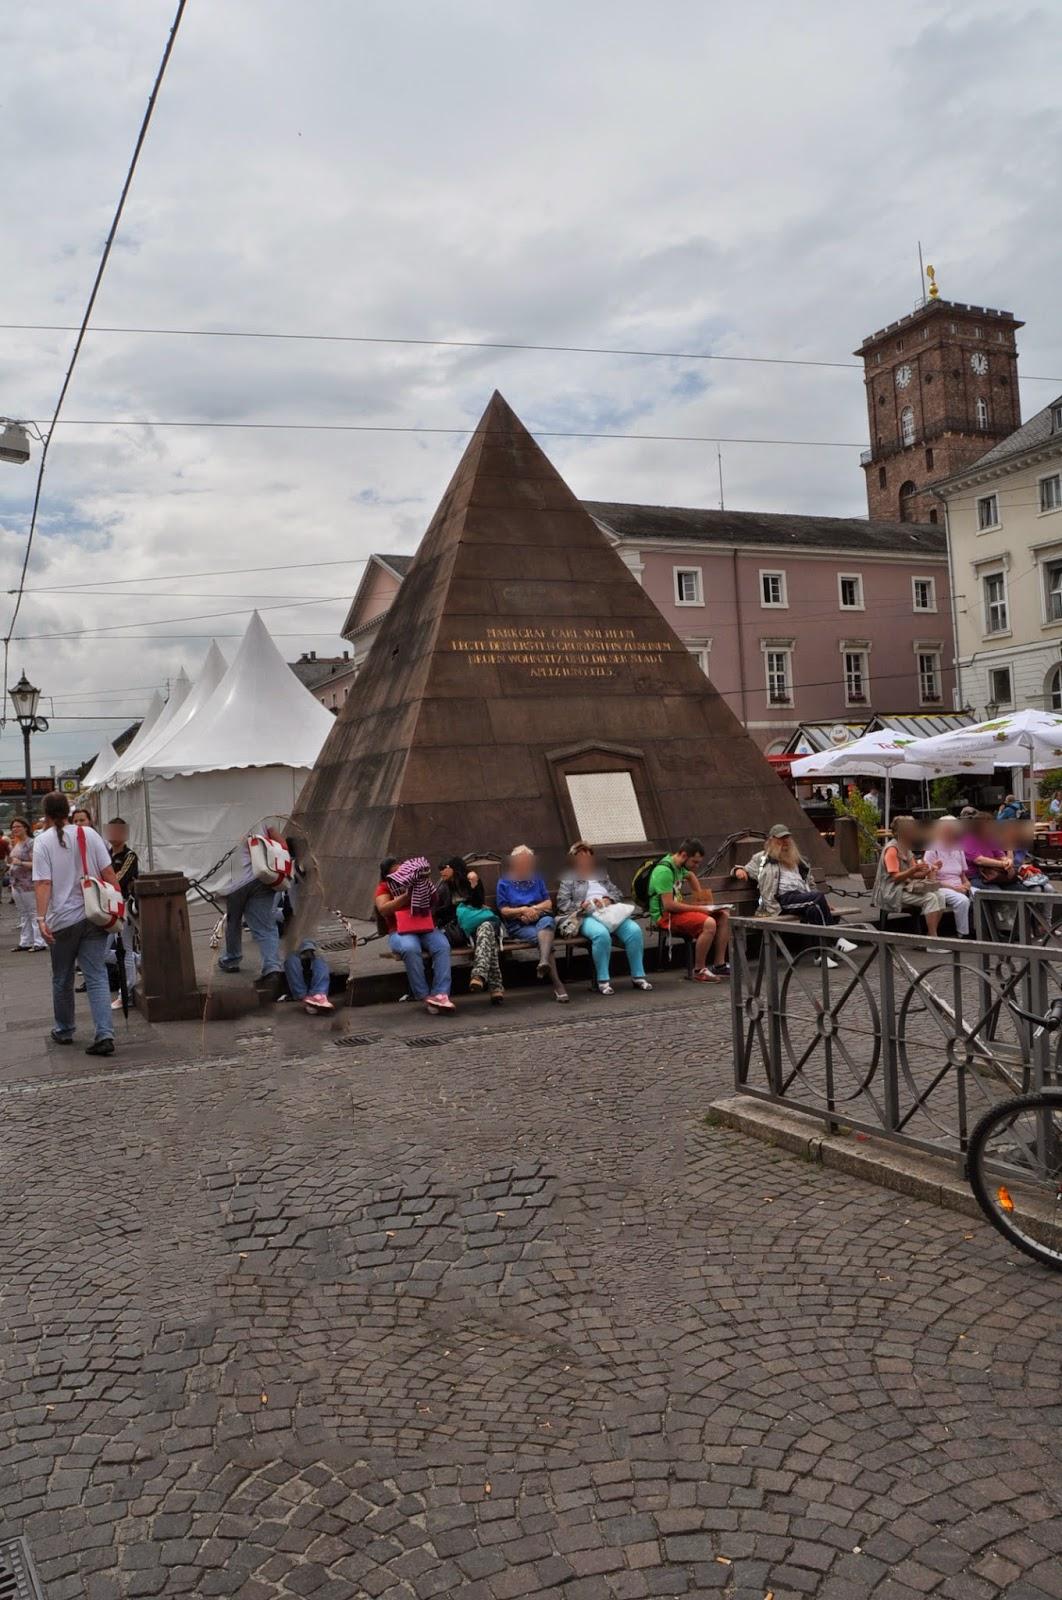 Foto de la pirámide de Karlsruhe